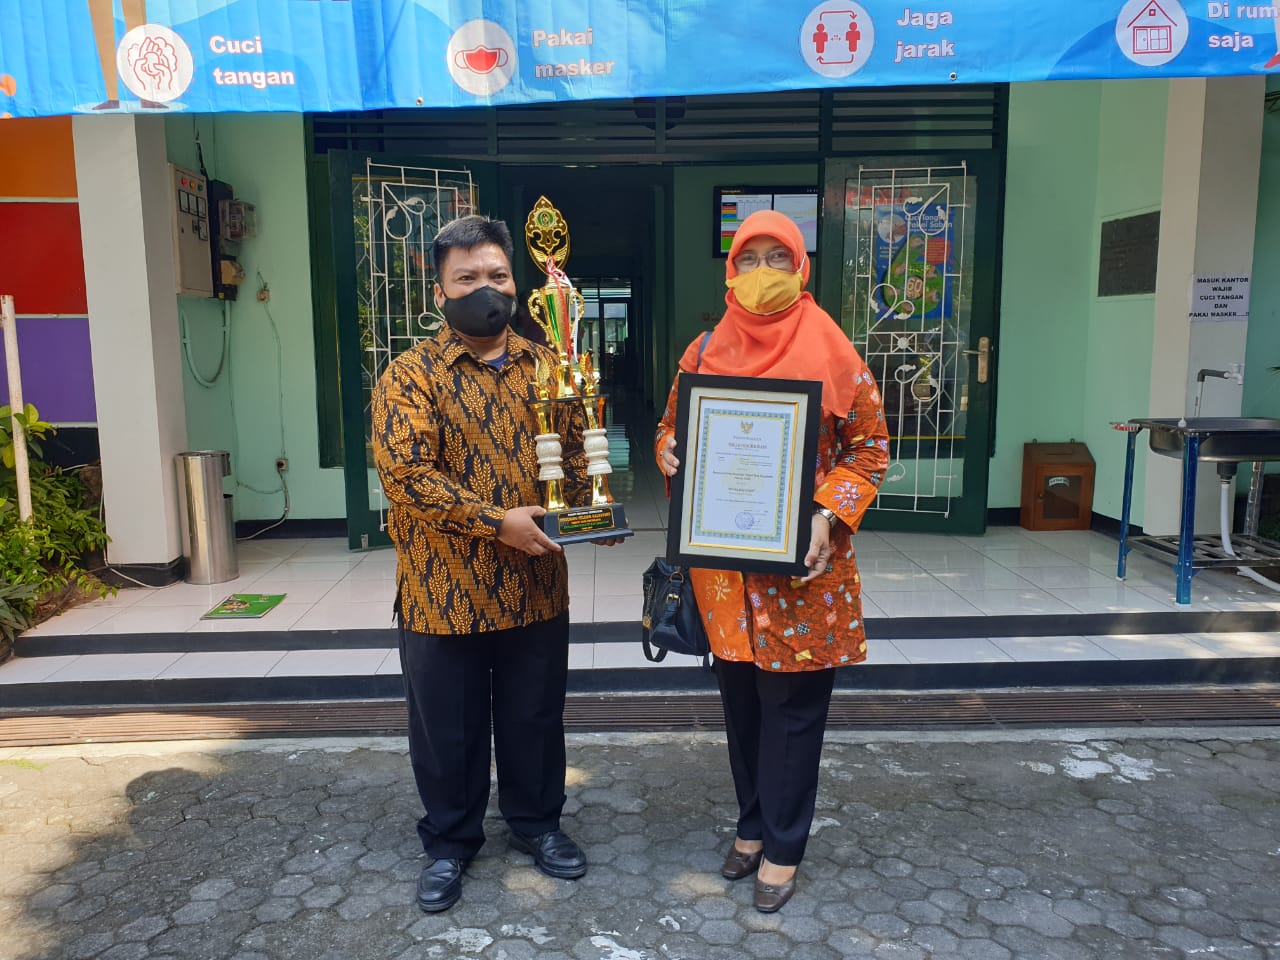 Warga Kelurahan Purbayan Menerima Penghargaan Perintis Lingkungan Kalpataru Kota Yogyakarta Tahun 2020